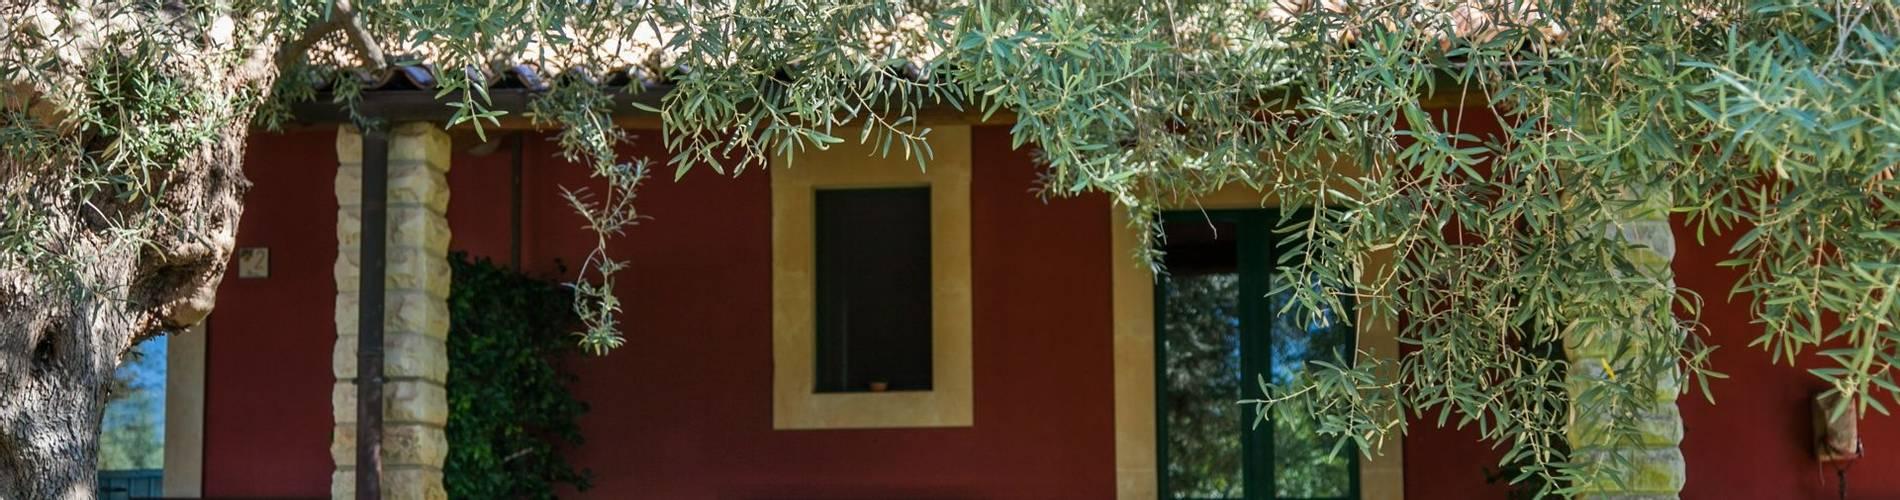 Il Paesino, Sicily, Italy (6).jpg